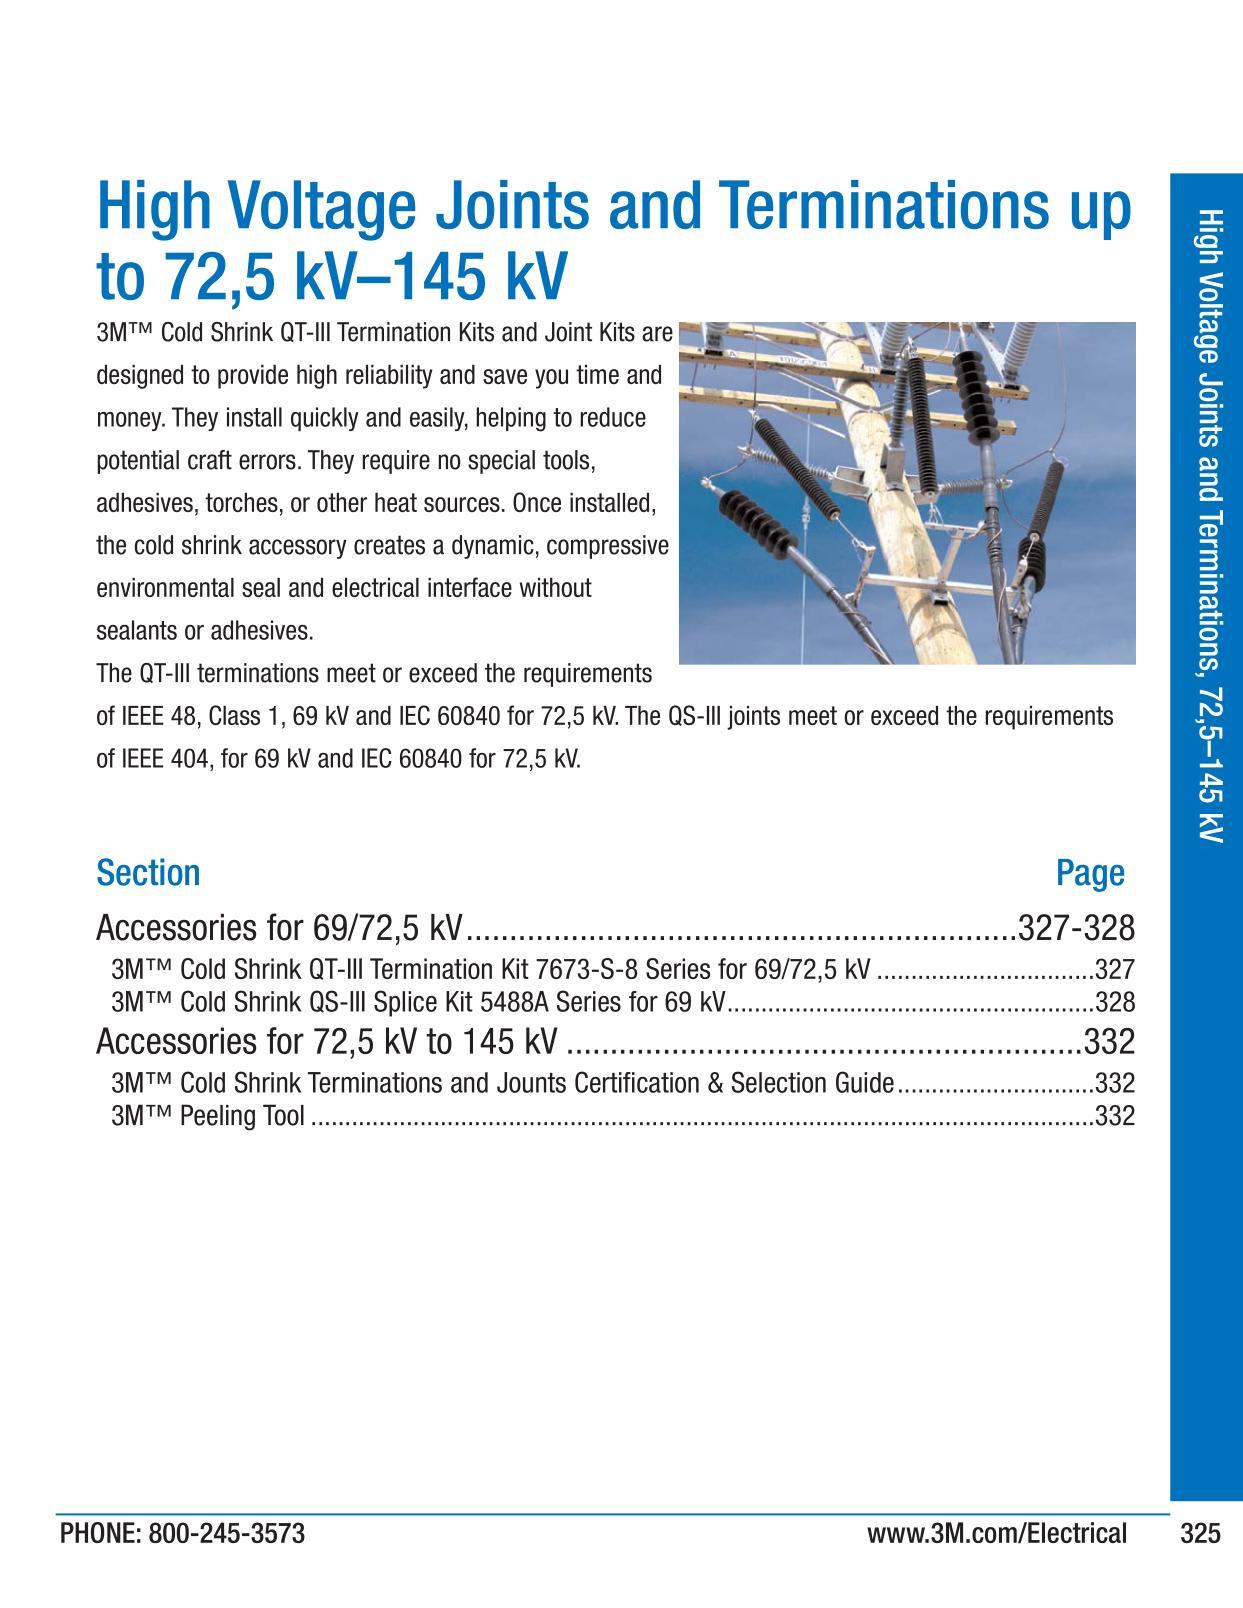 High voltage joints and terminations 72 5 145 kv 3m catalogs xflitez Choice Image